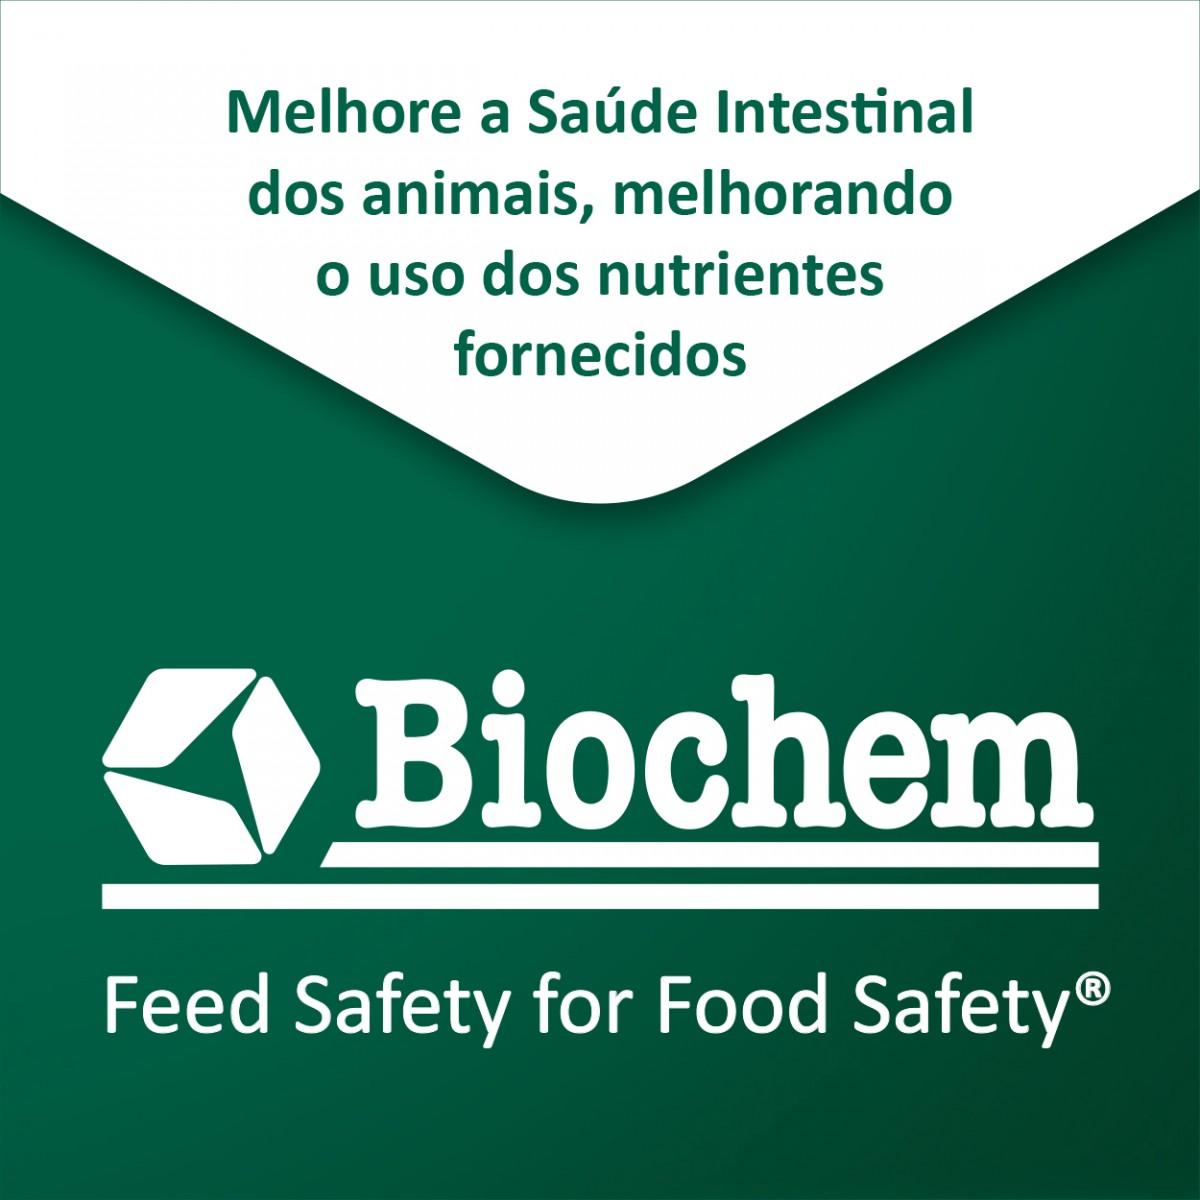 Biochem site – lateral